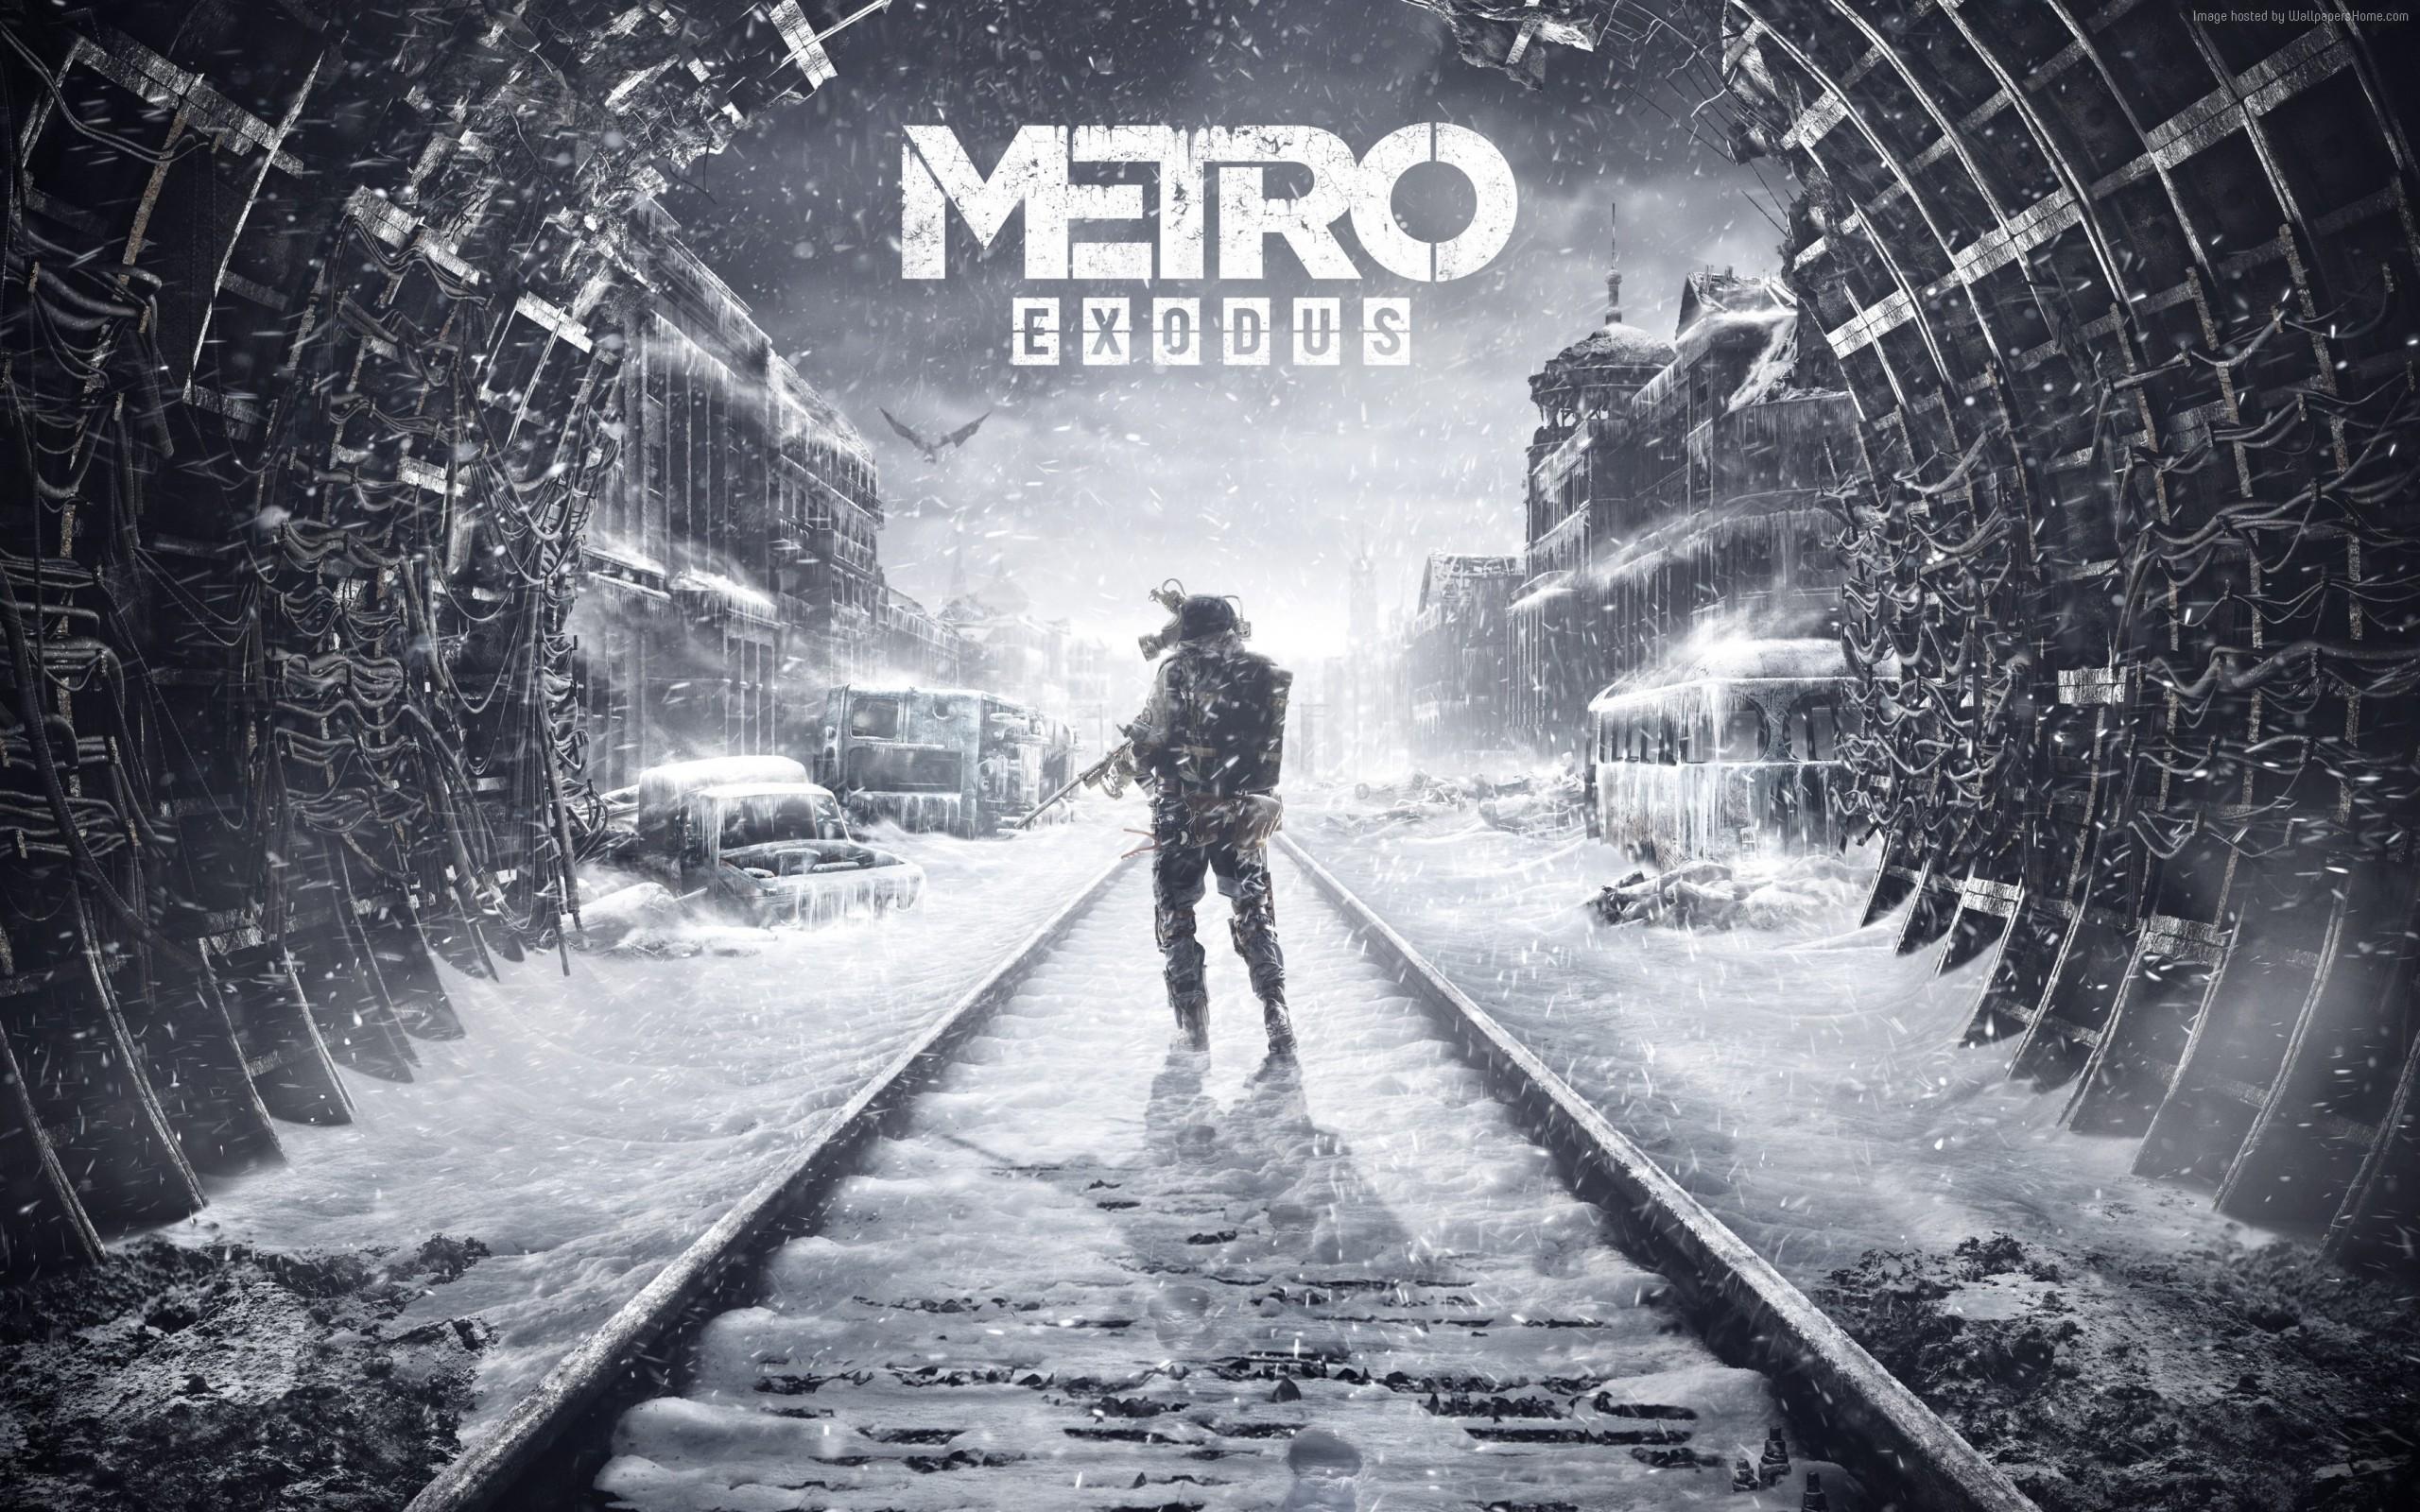 metro, exodus, 2019